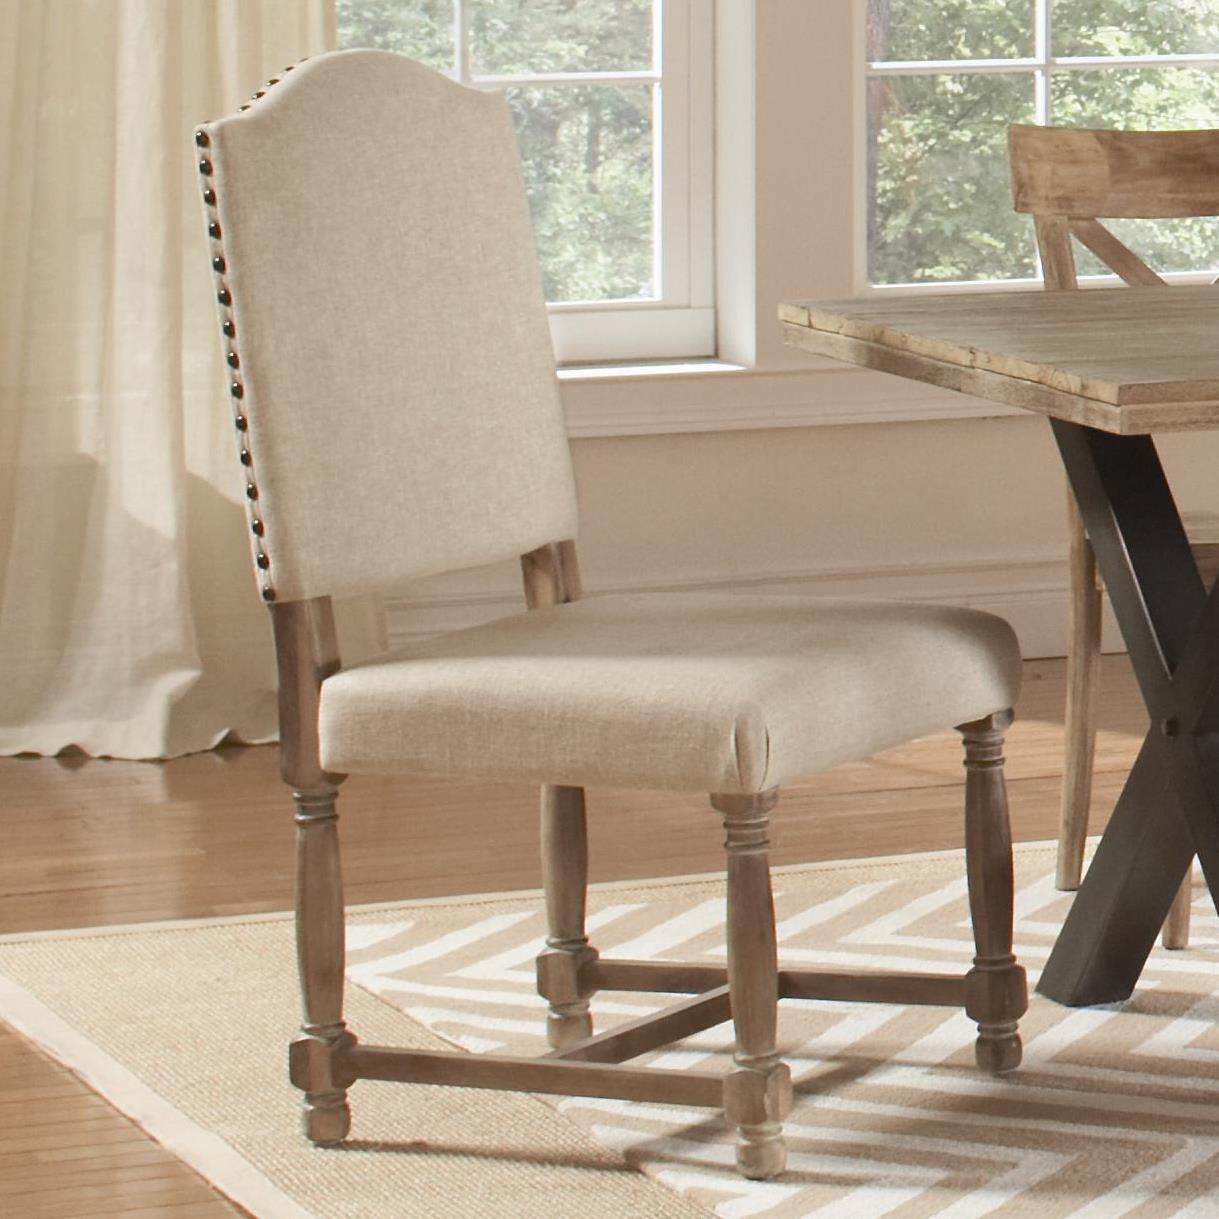 Largo Callista Upholstered Side Chair - Item Number: D680-43